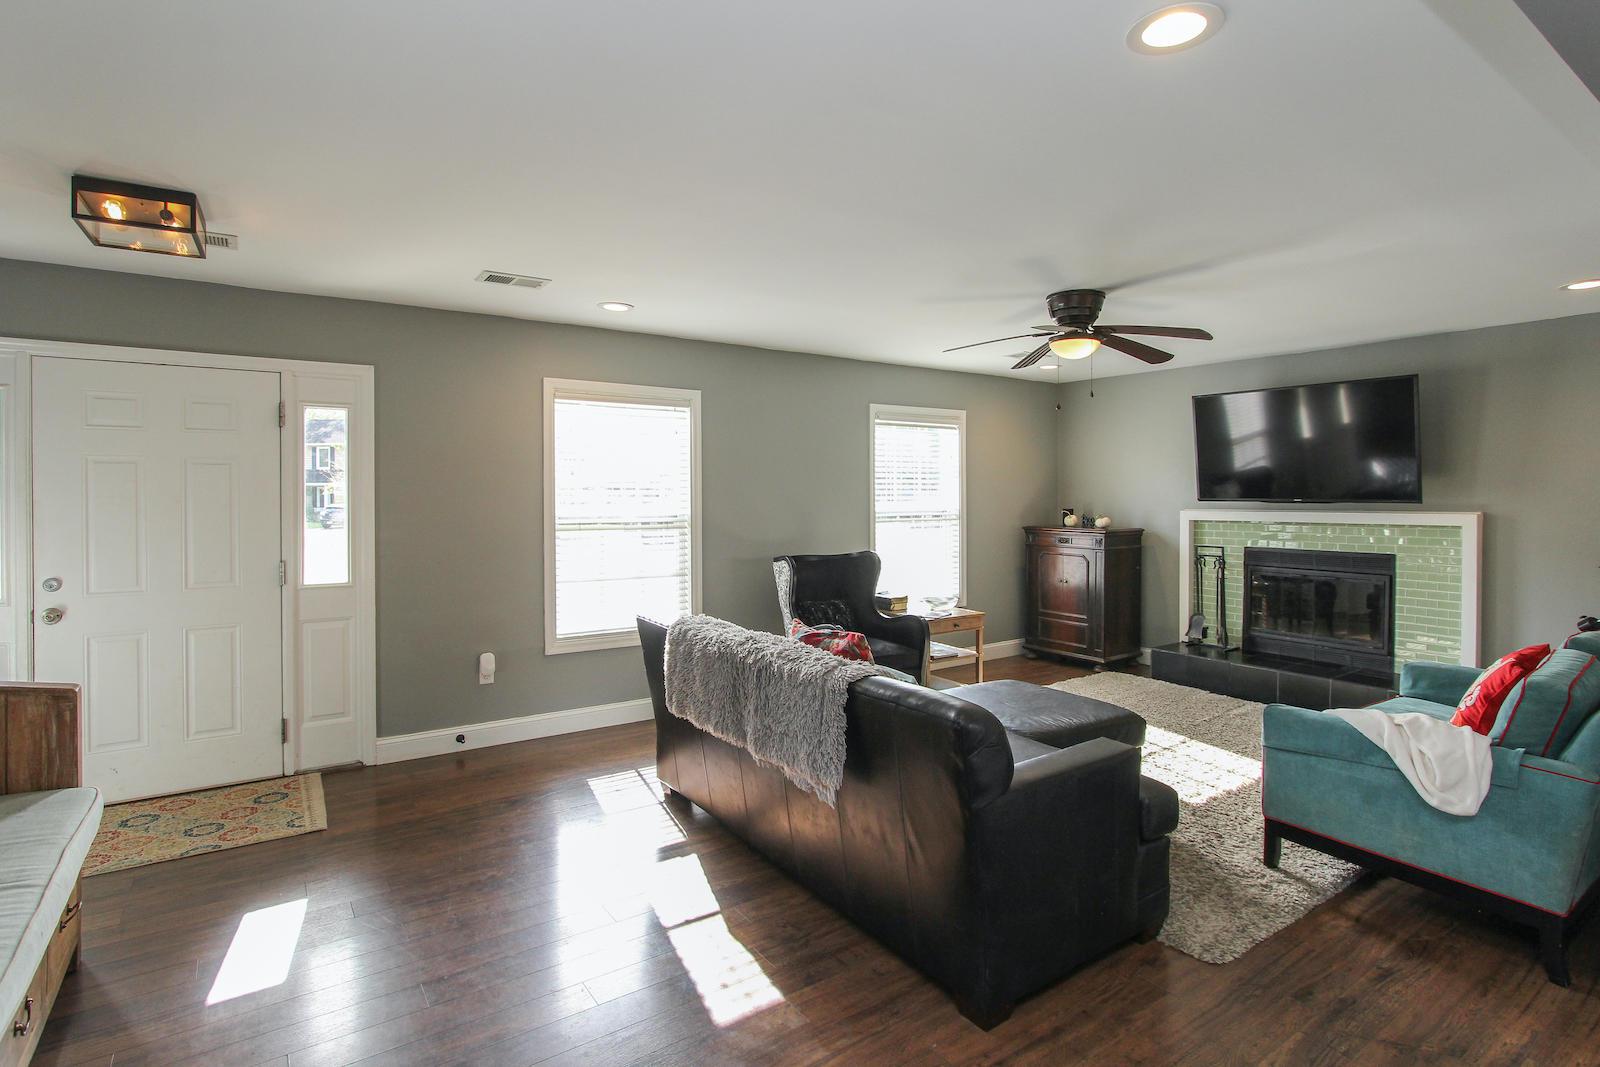 Landings Run Homes For Sale - 1548 Wickfield, Mount Pleasant, SC - 18